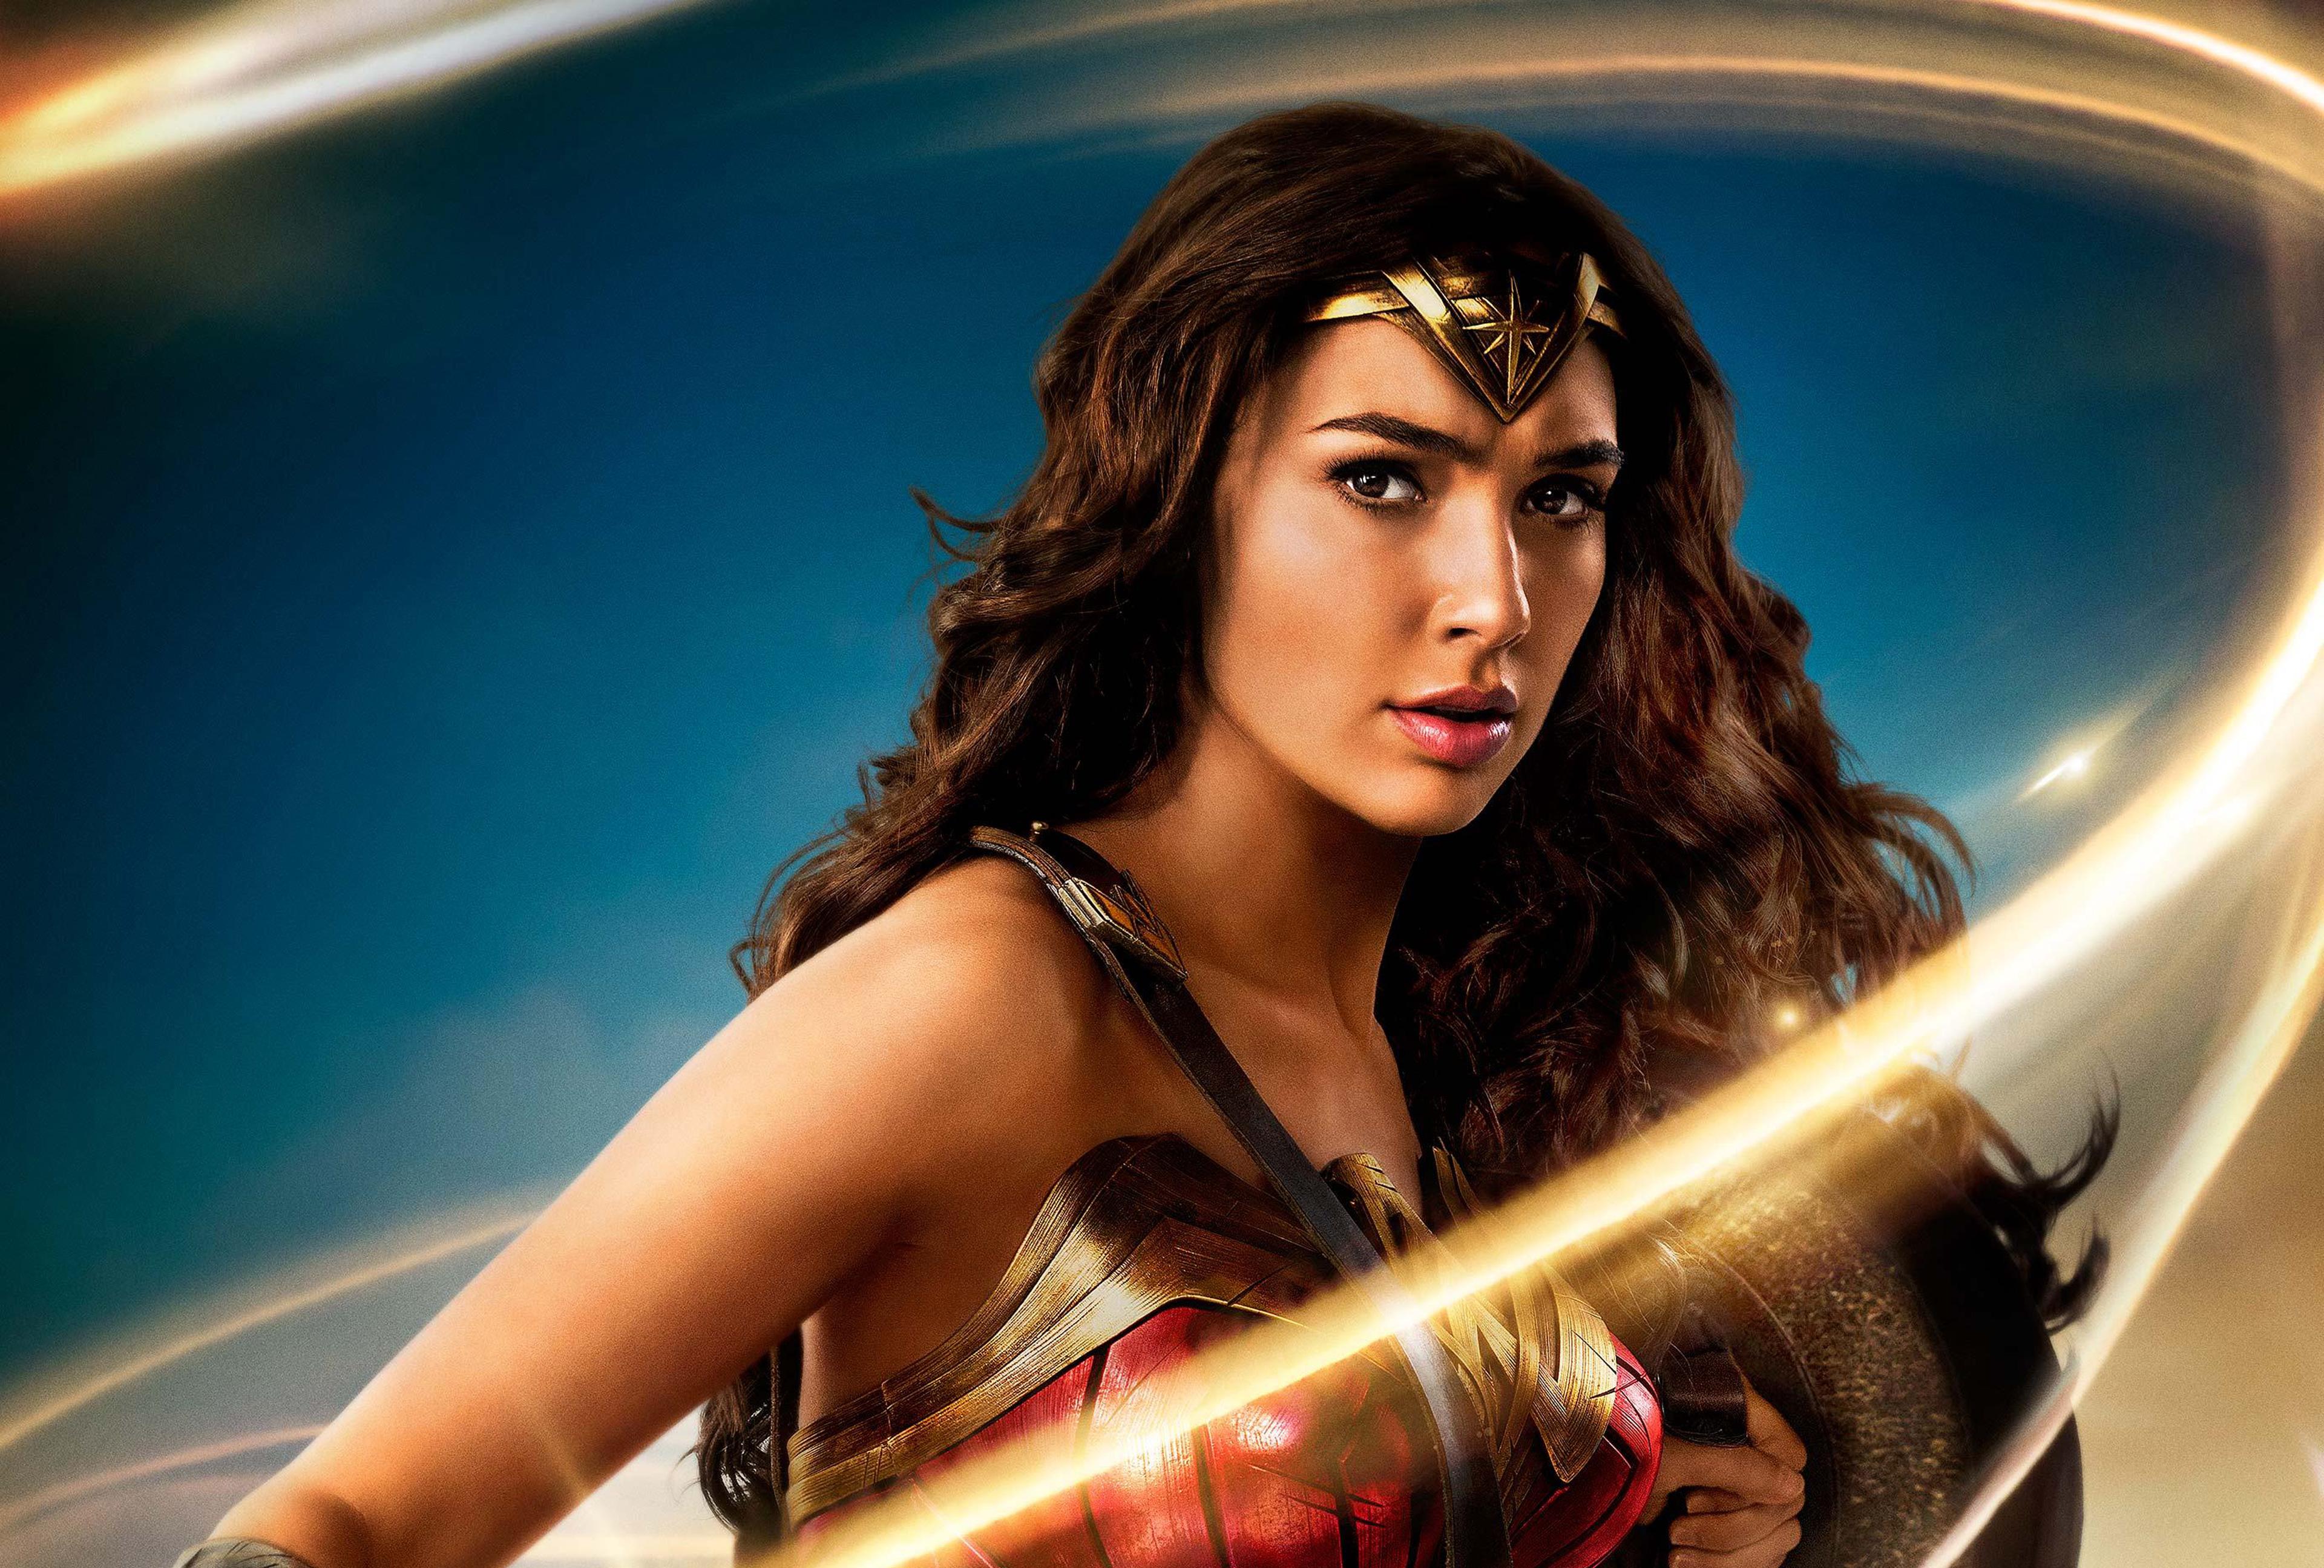 Wallpaper Wonder Woman 4k Movies 11307: Gal Gadot Wonder Woman New 4k, HD Movies, 4k Wallpapers